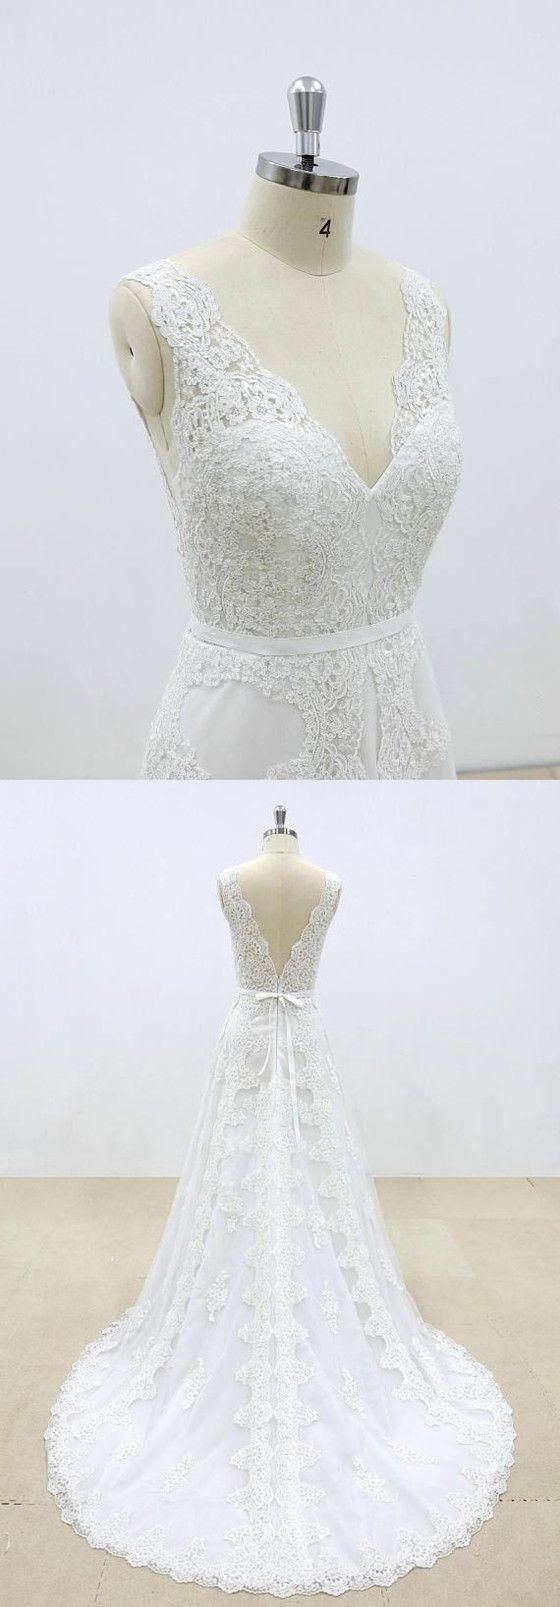 Hot Selling Gorgeous V-neck Lace Sleeveless Wedding Dresses with train, WD0367